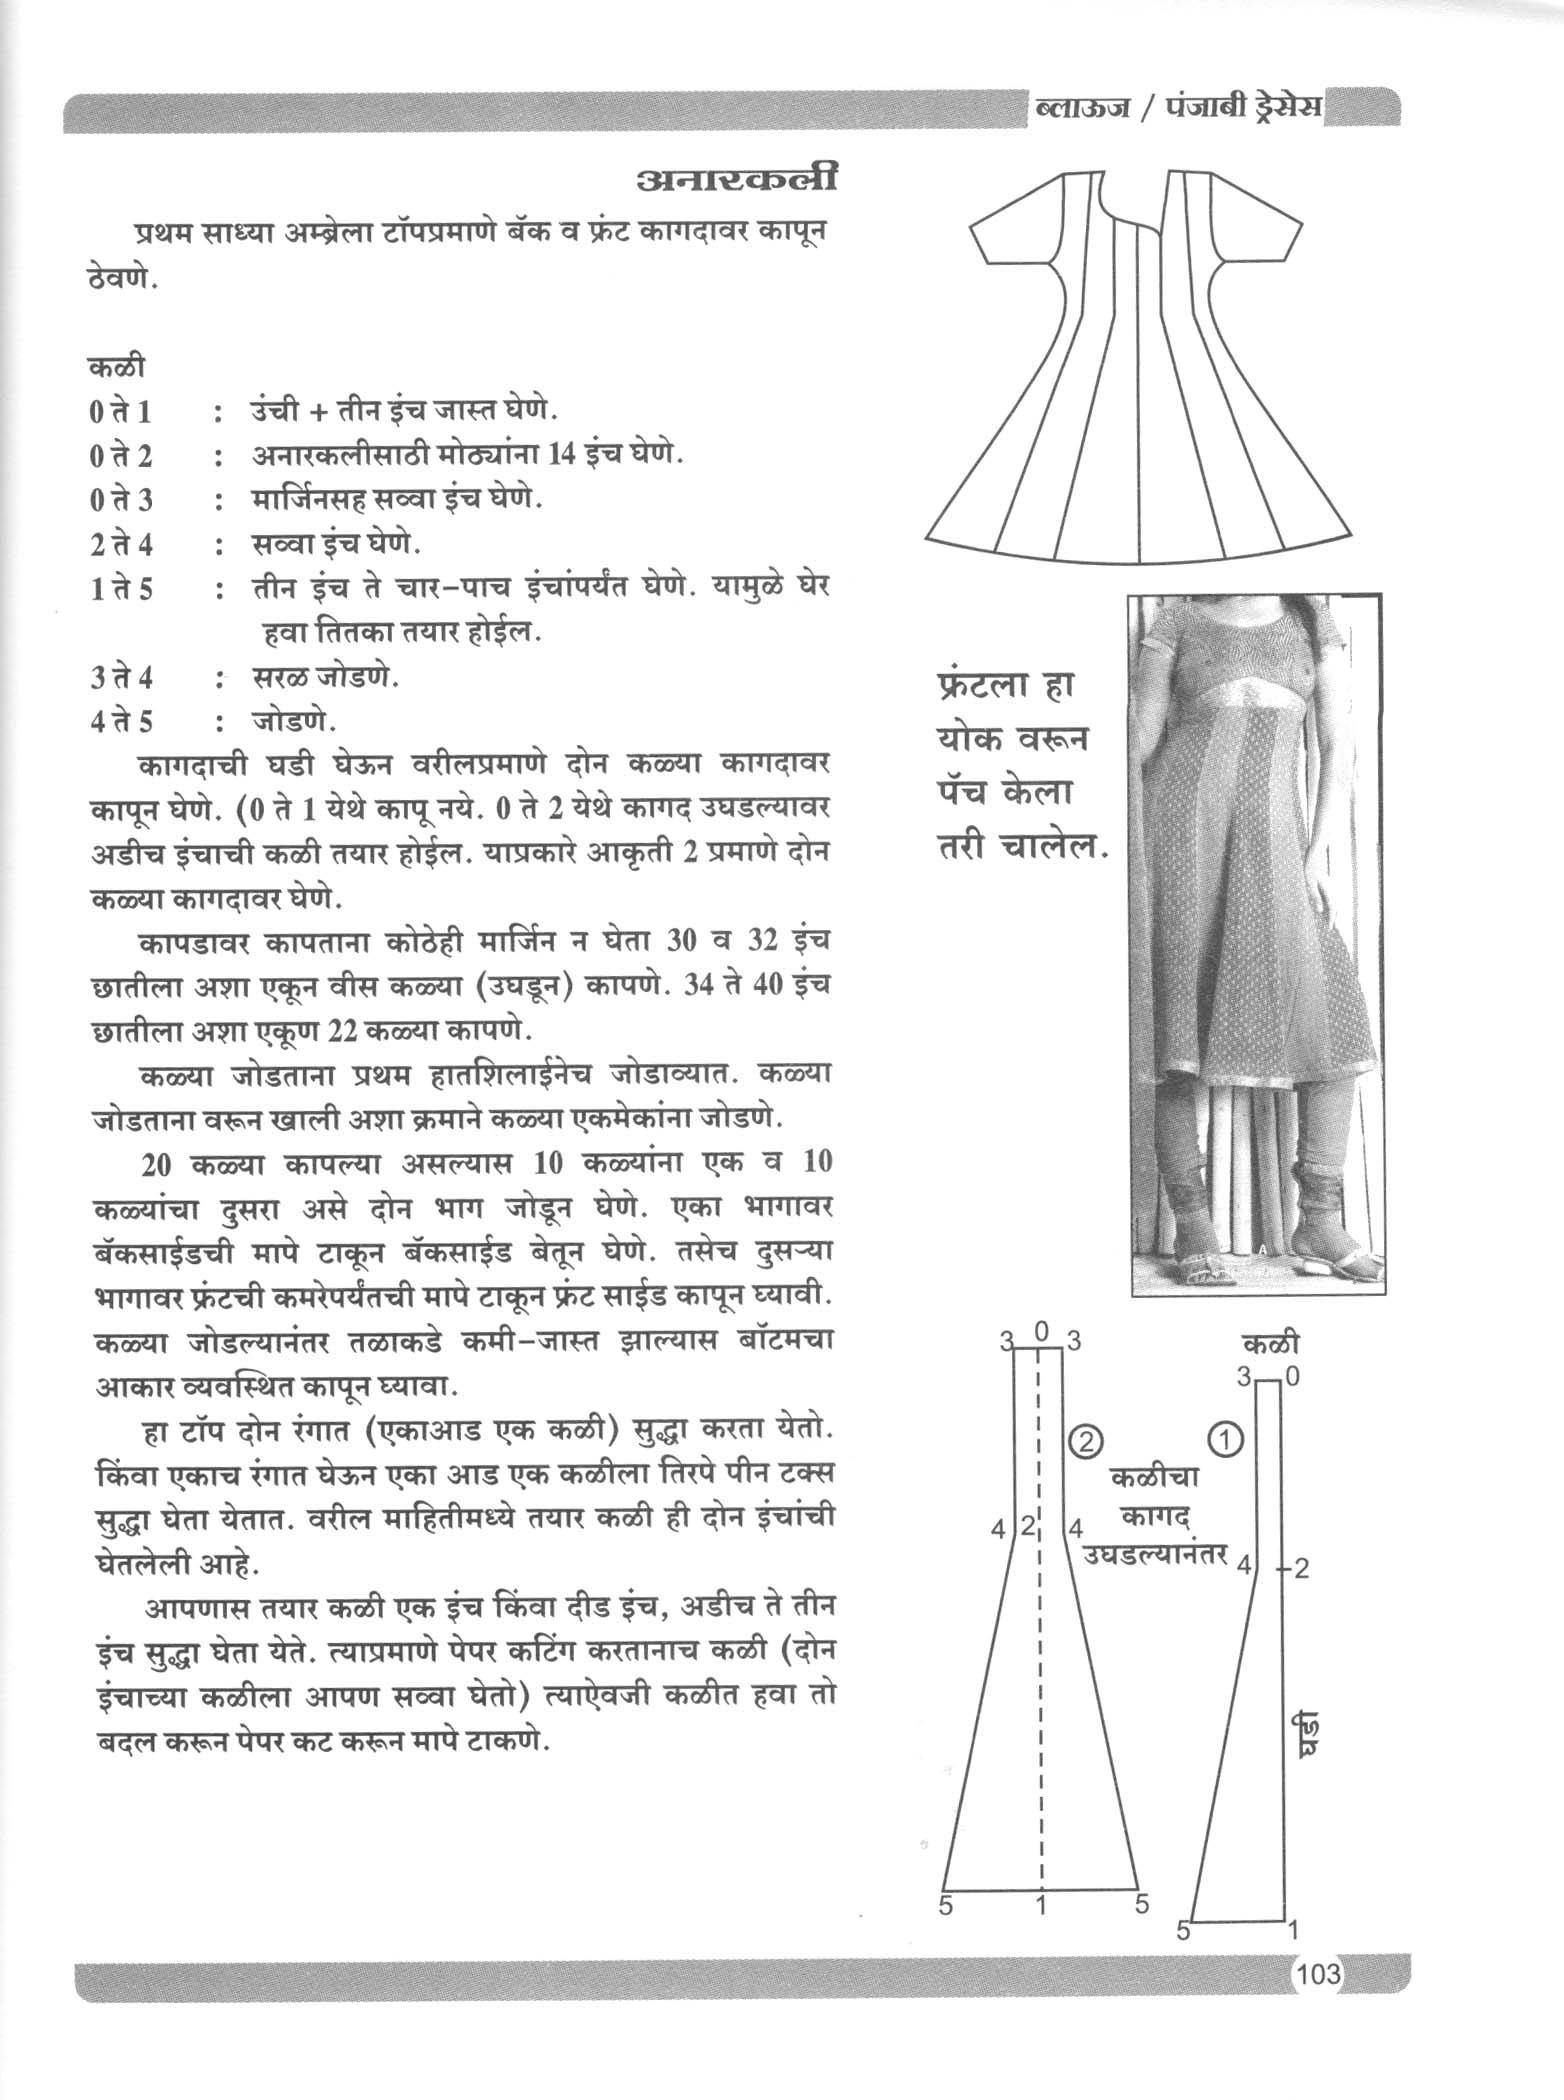 Buy Liberty Blouse Punjabi Dresses Marathi Book Online At Low Prices In India Liberty Blouse Punjabi Dresses Marathi Reviews Ratings Amazon In